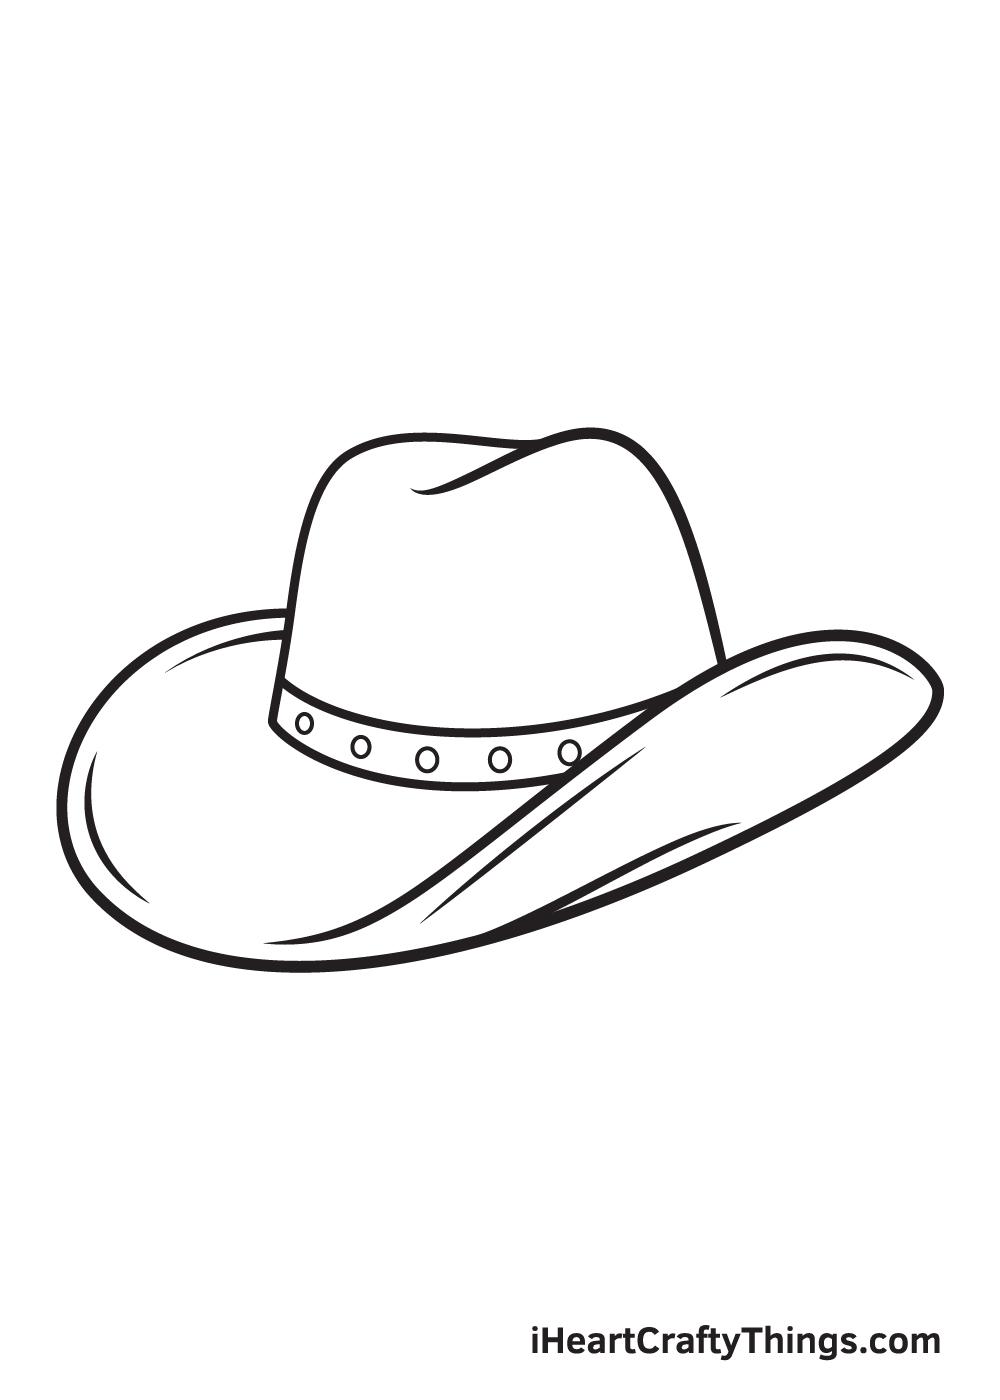 cowboy hat drawing - step 9